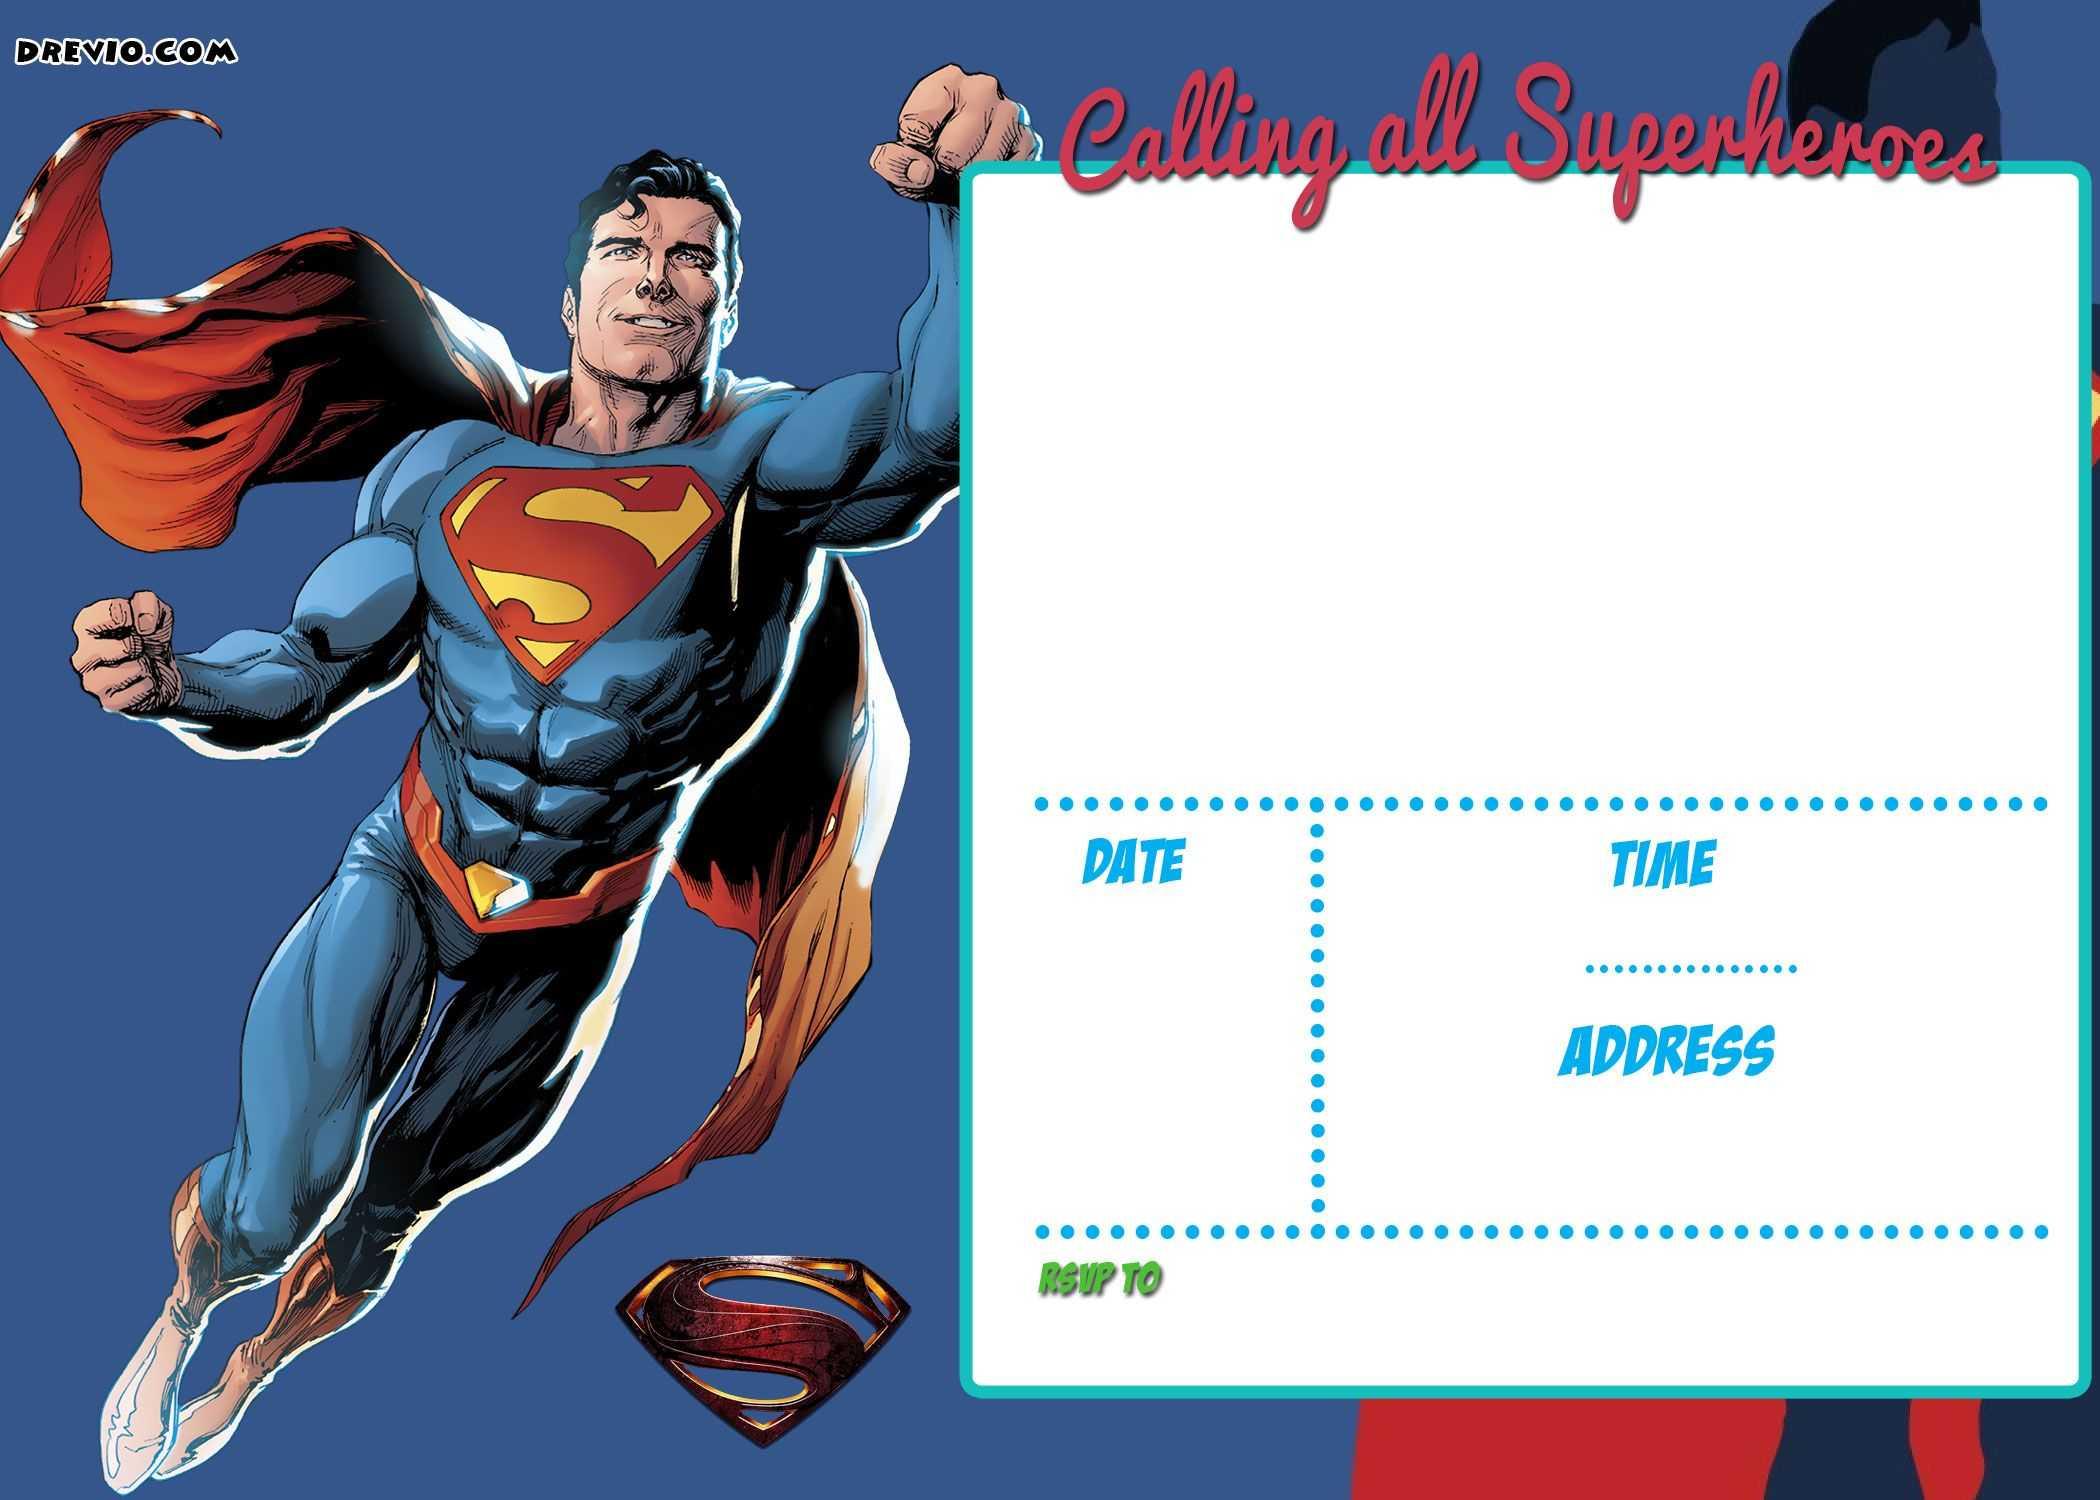 Superman Birthday Card Template - Atlantaauctionco Throughout Superman Birthday Card Template